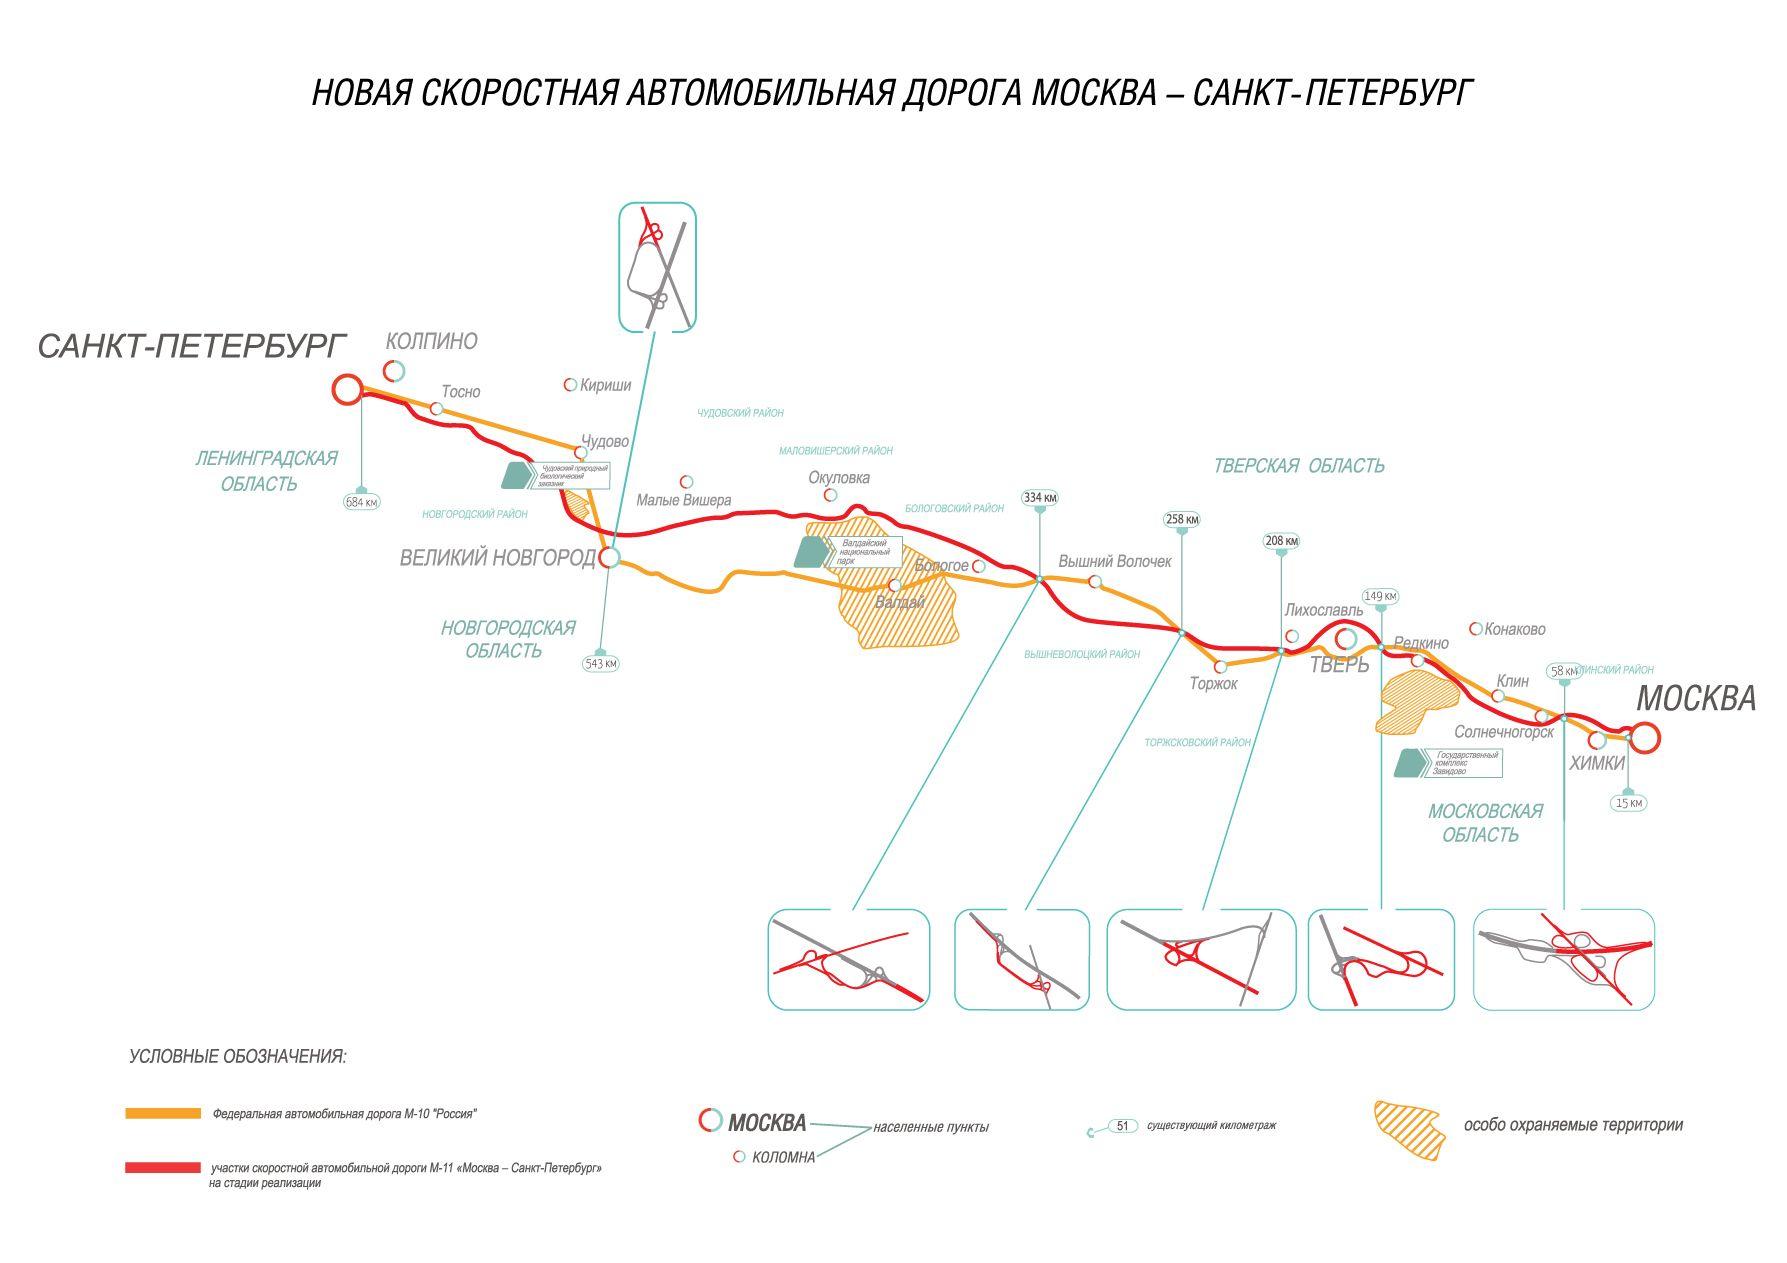 М11 москва санкт петербург схема фото 389